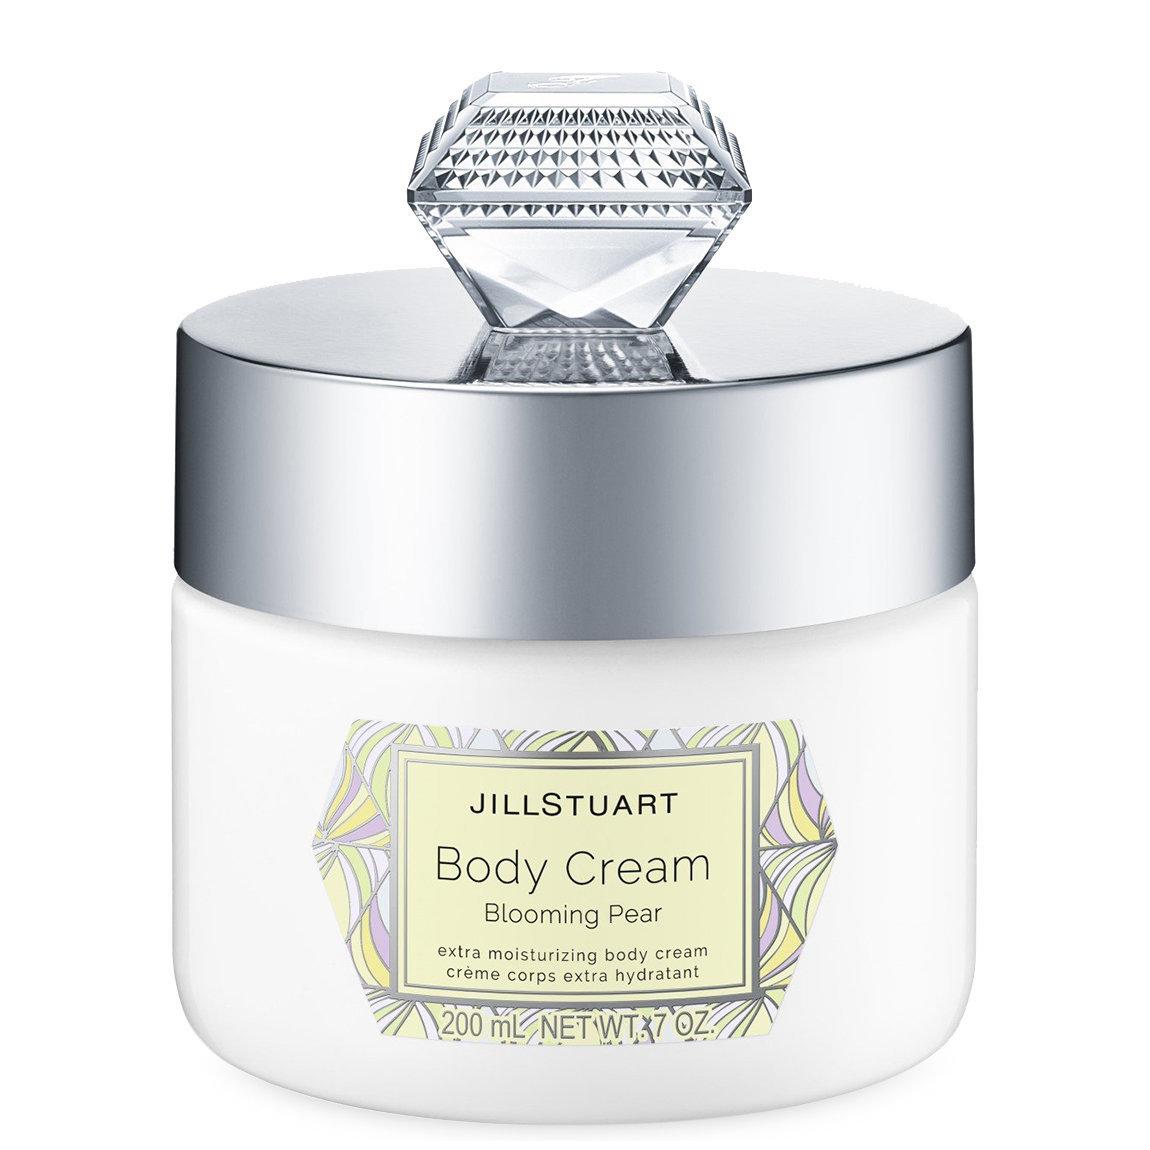 JILL STUART Beauty Body Cream Blooming Pear alternative view 1 - product swatch.